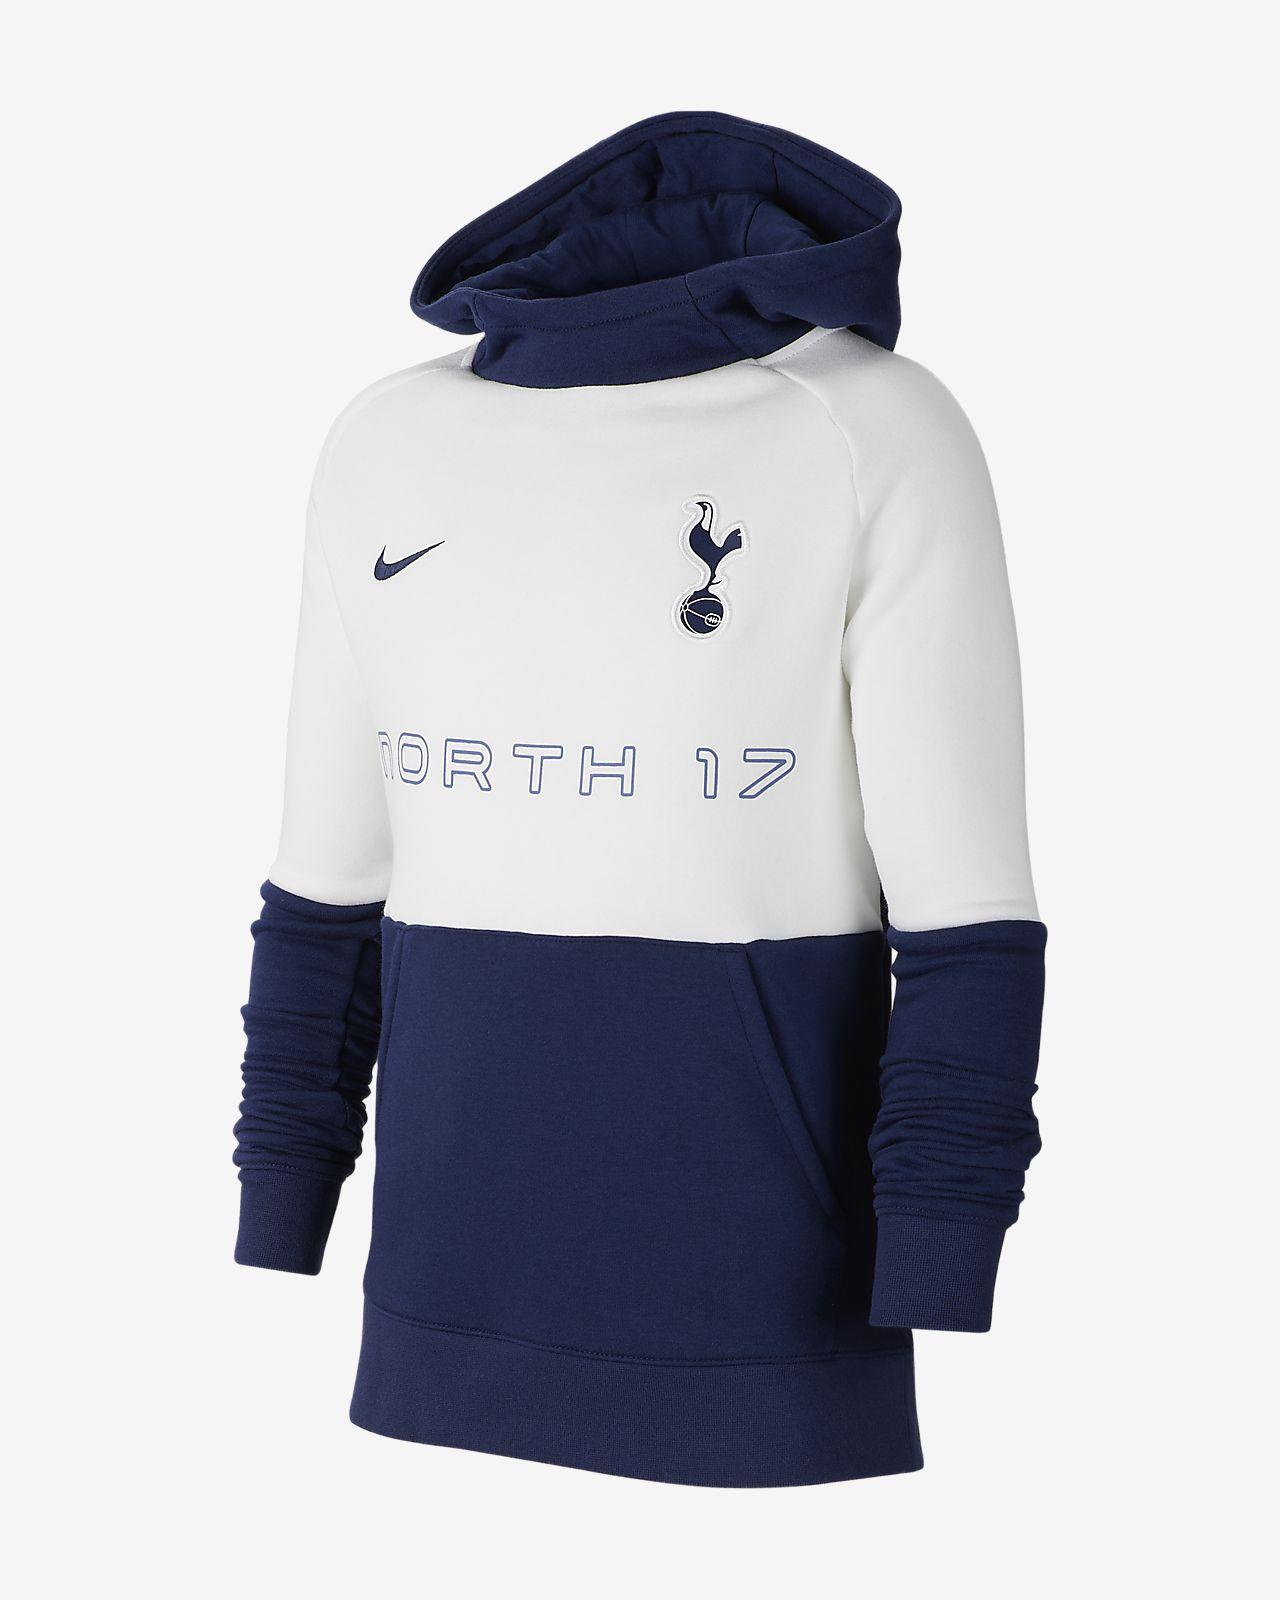 Tottenham Hotspur FC Older Kids' Fleece Pullover Hoodie